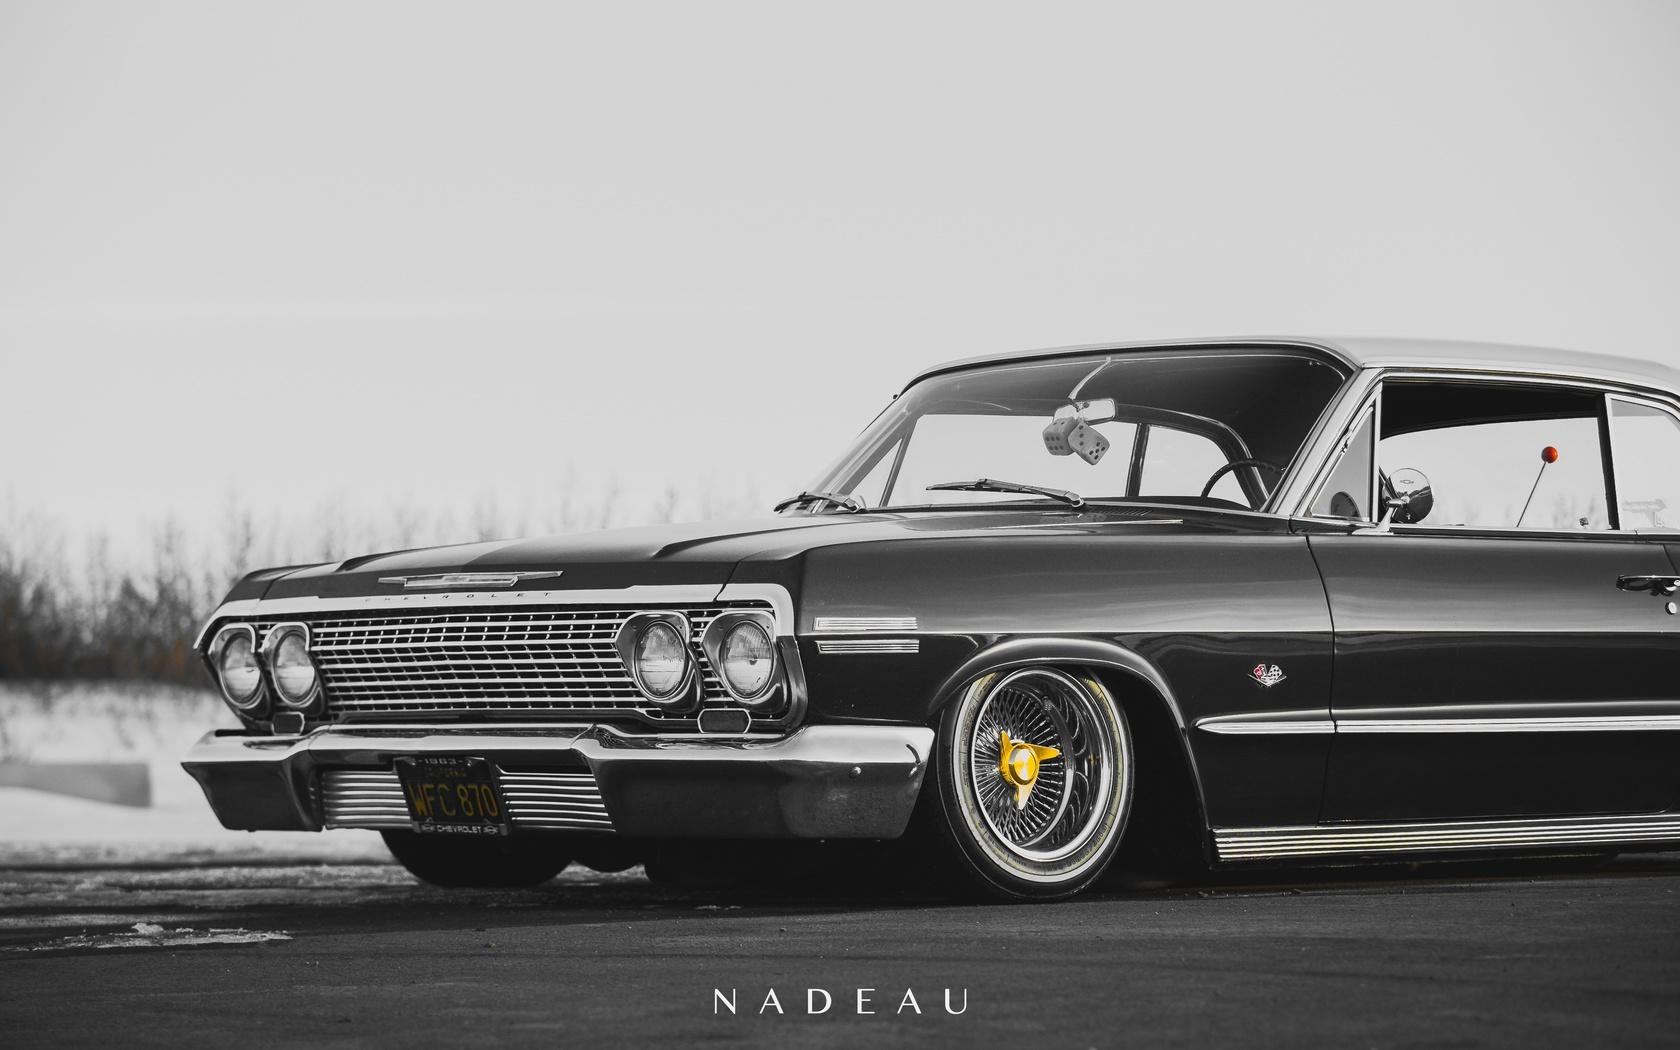 impala, chevrolet, авто, классика